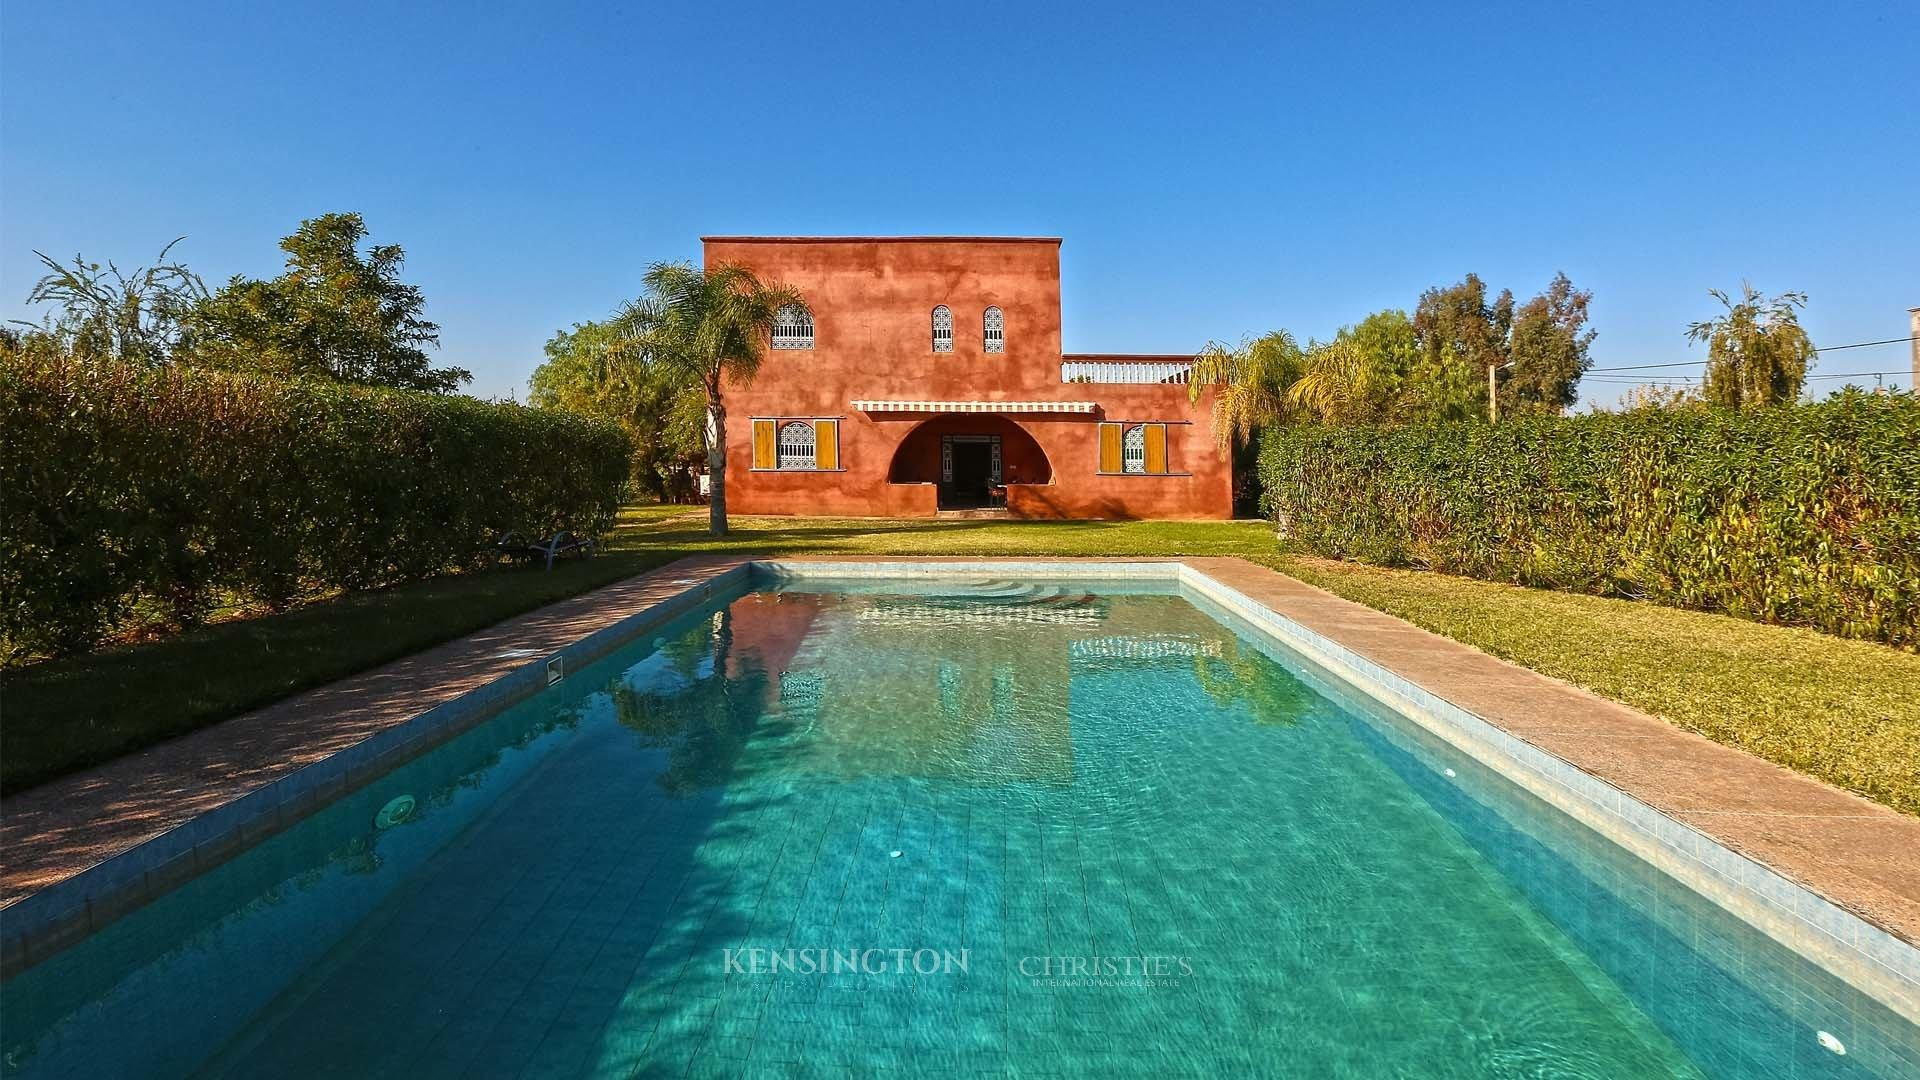 KPPM01339: Villa Suba Luxury Villa Marrakech Morocco